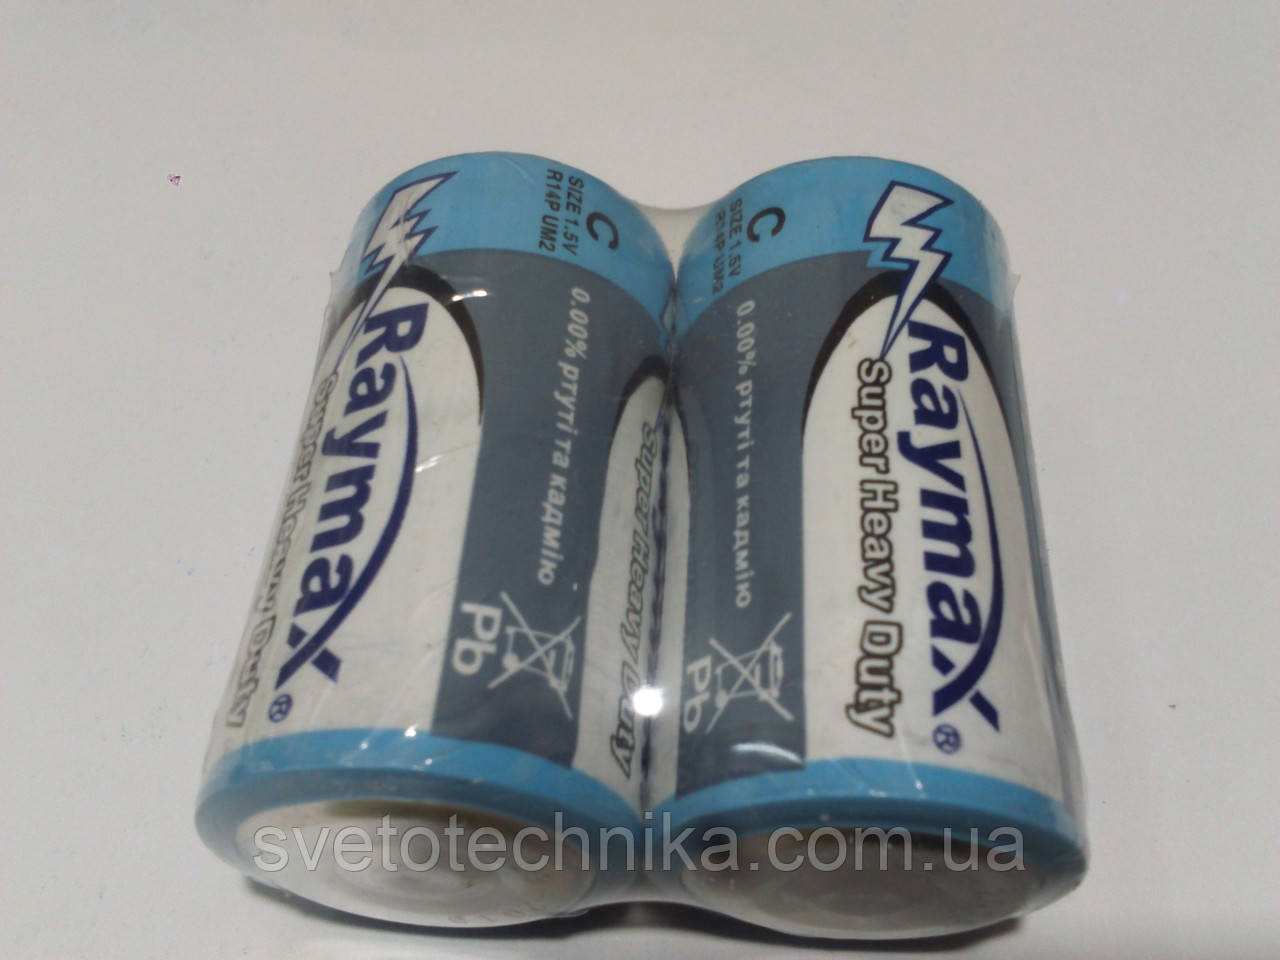 Батарейка (24шт.) Raymax C2 R14P UM2 C 1.5V